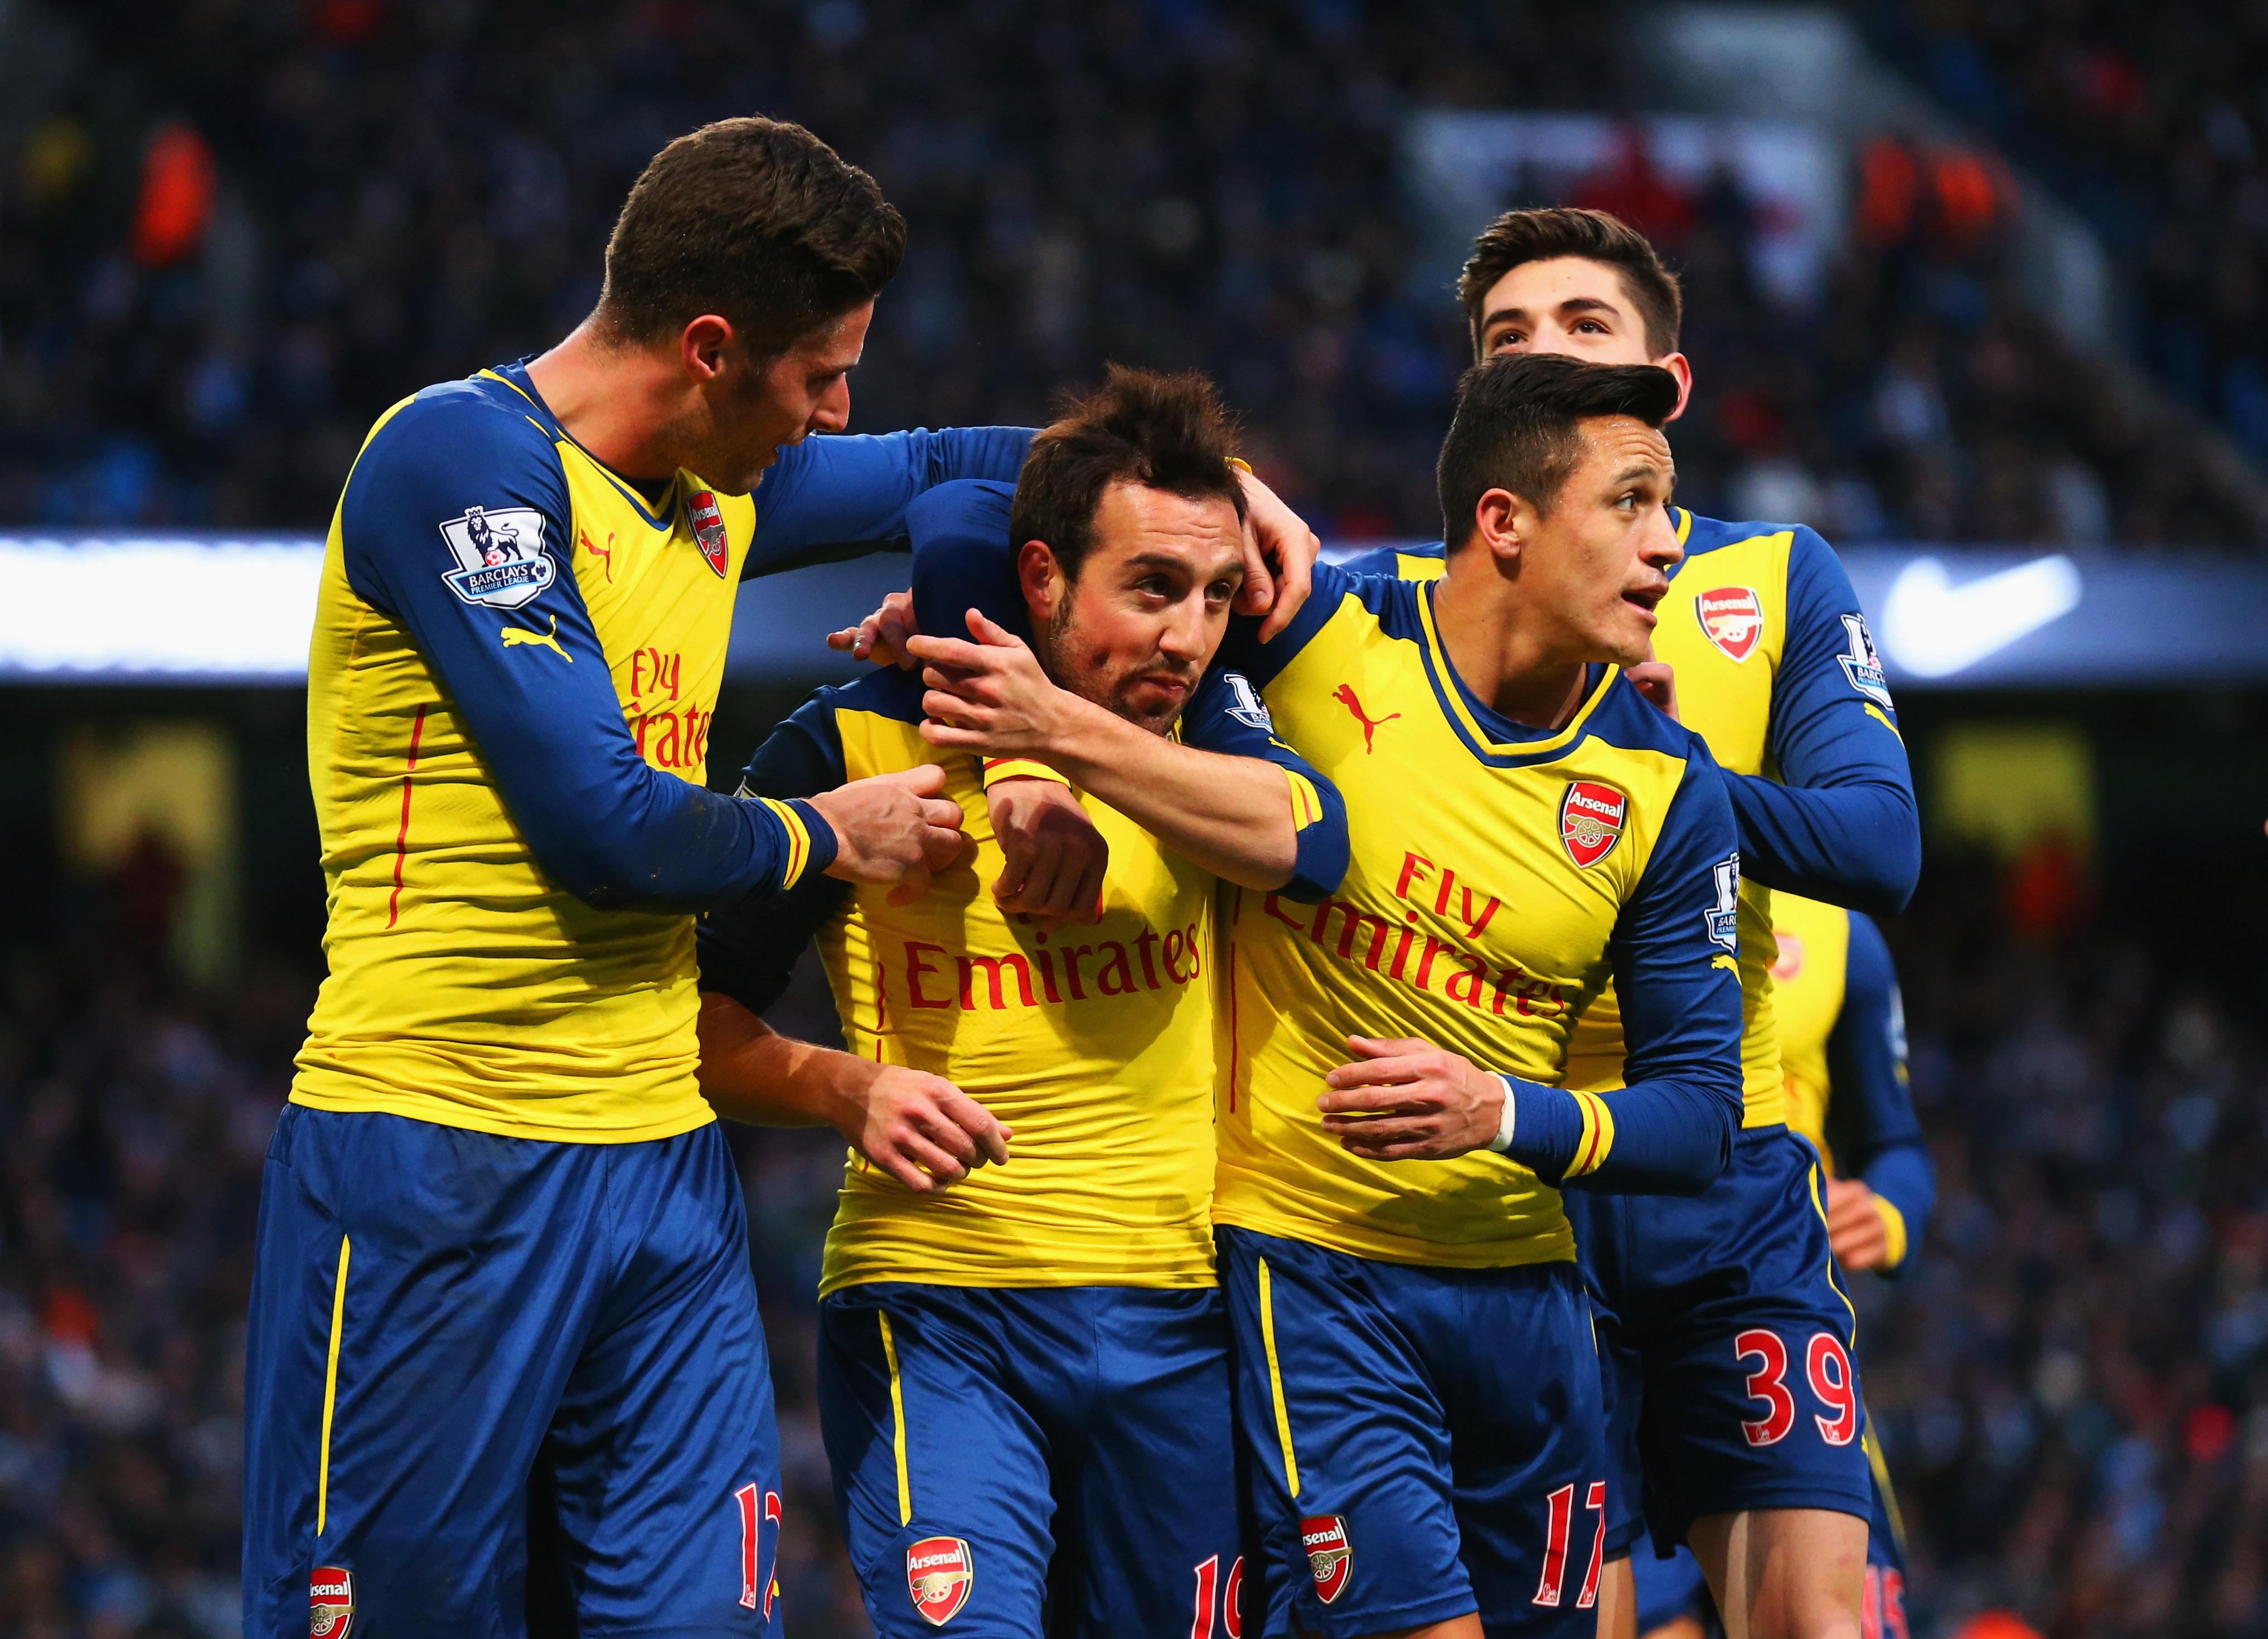 MANCHESTER, ENGLAND - JANUARY 18: Santi Cazorla of Arsenal (2L) celebrates with team mates